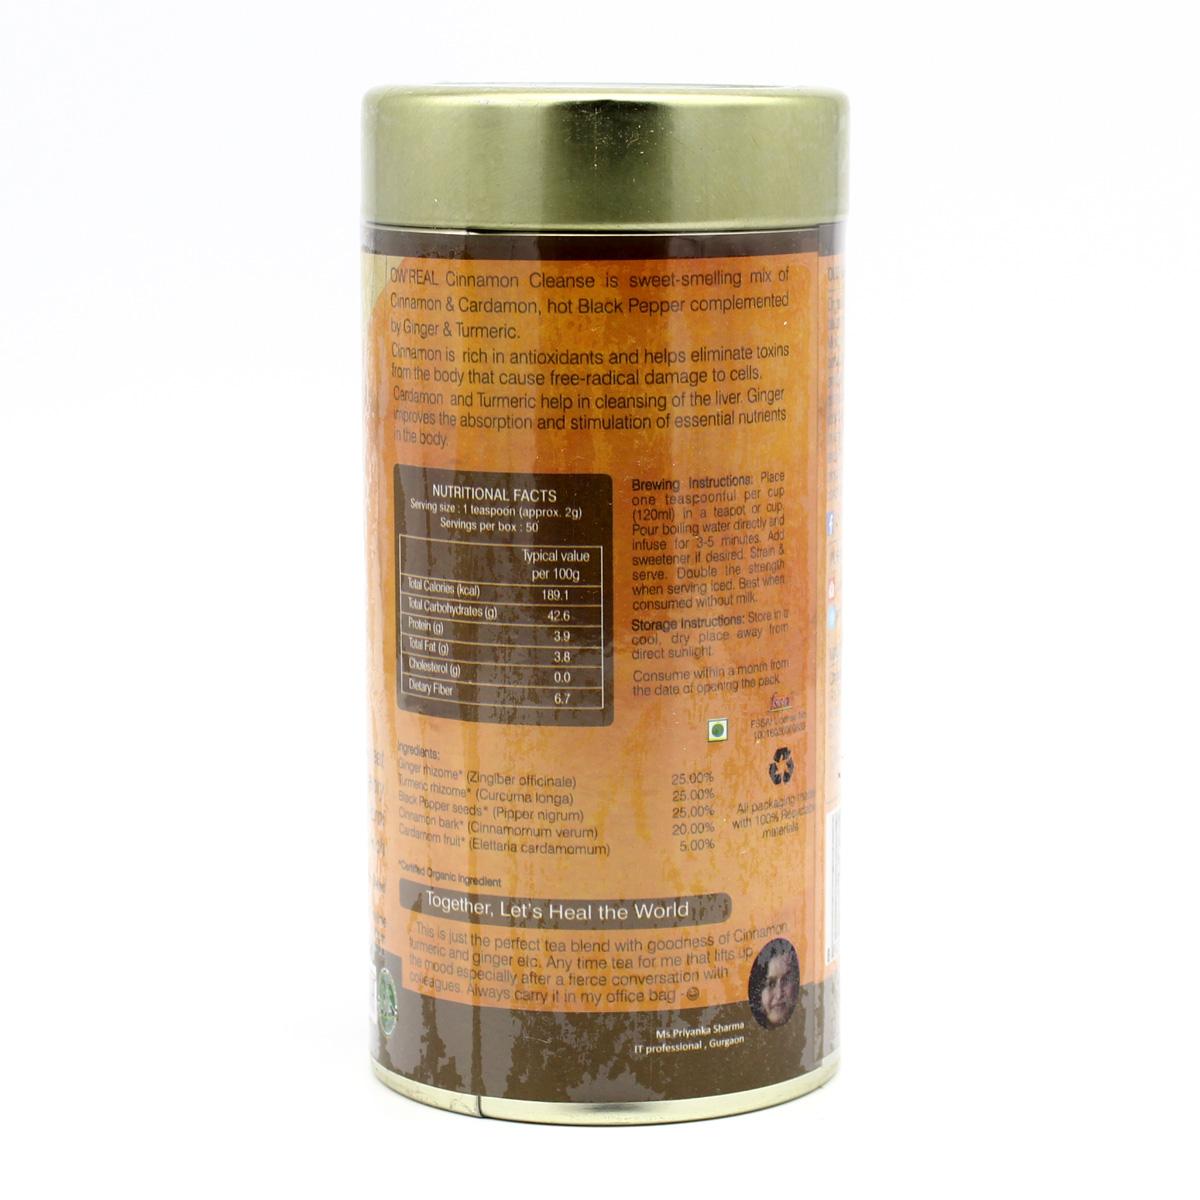 Cinnamon Cleanse травяной чай с корицей, смесь пряностей Organic Wellness 100 г